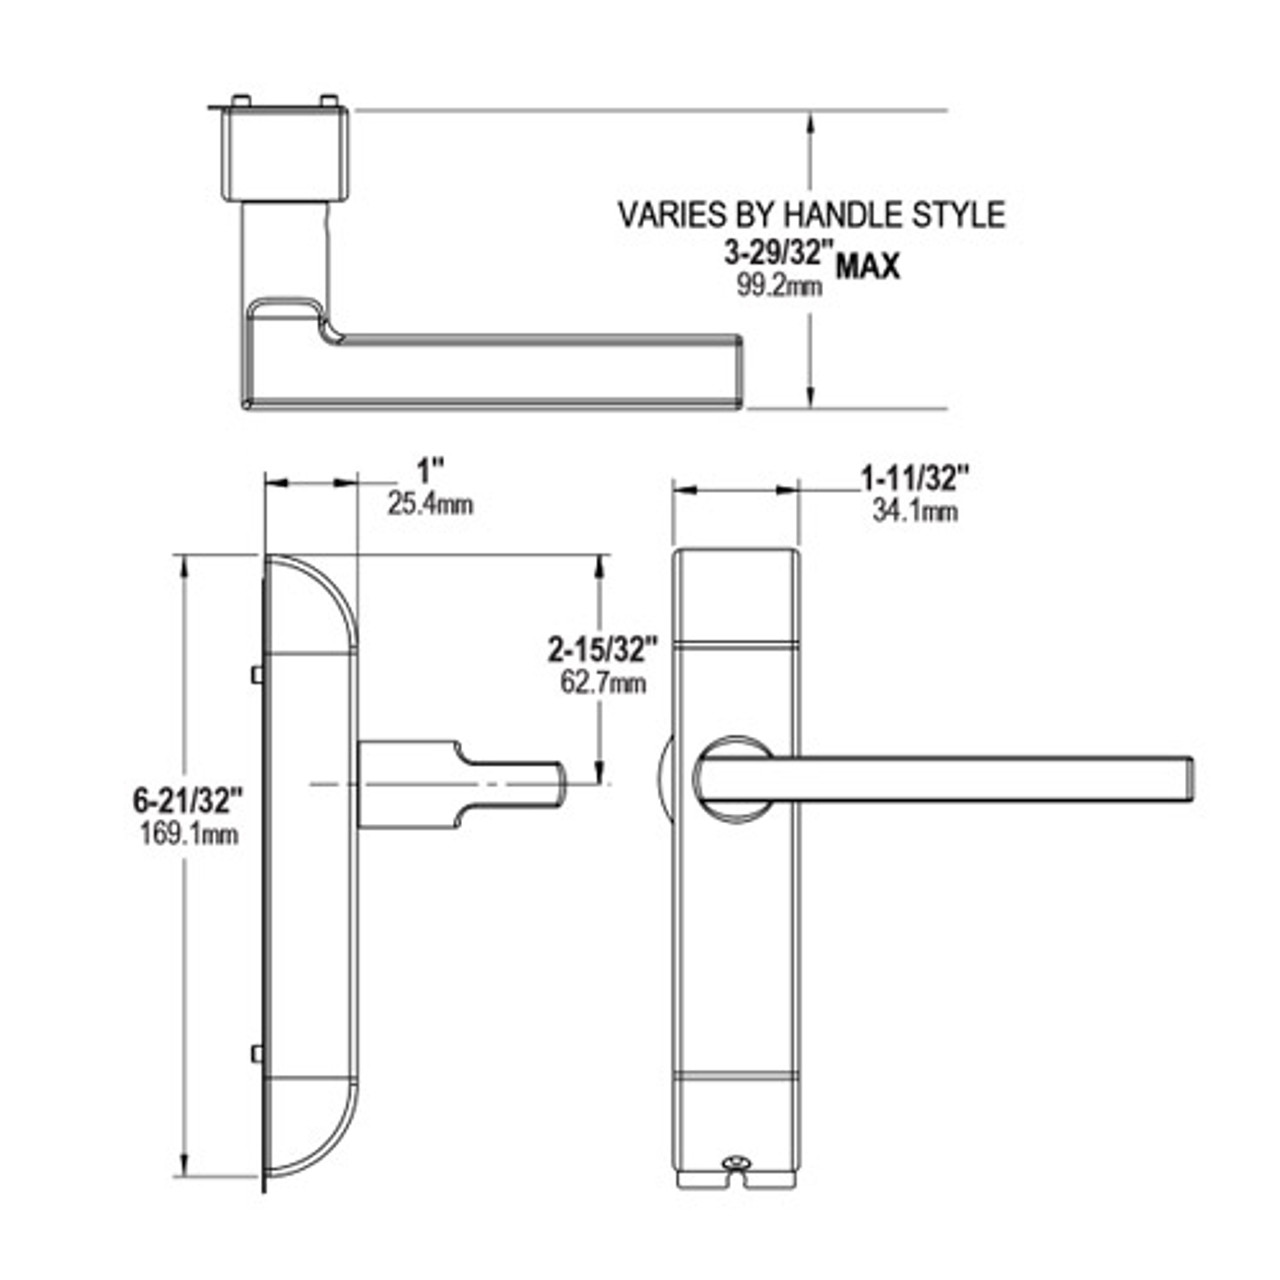 4600-MD-621-US32 Adams Rite MD Designer handle Dimensional View